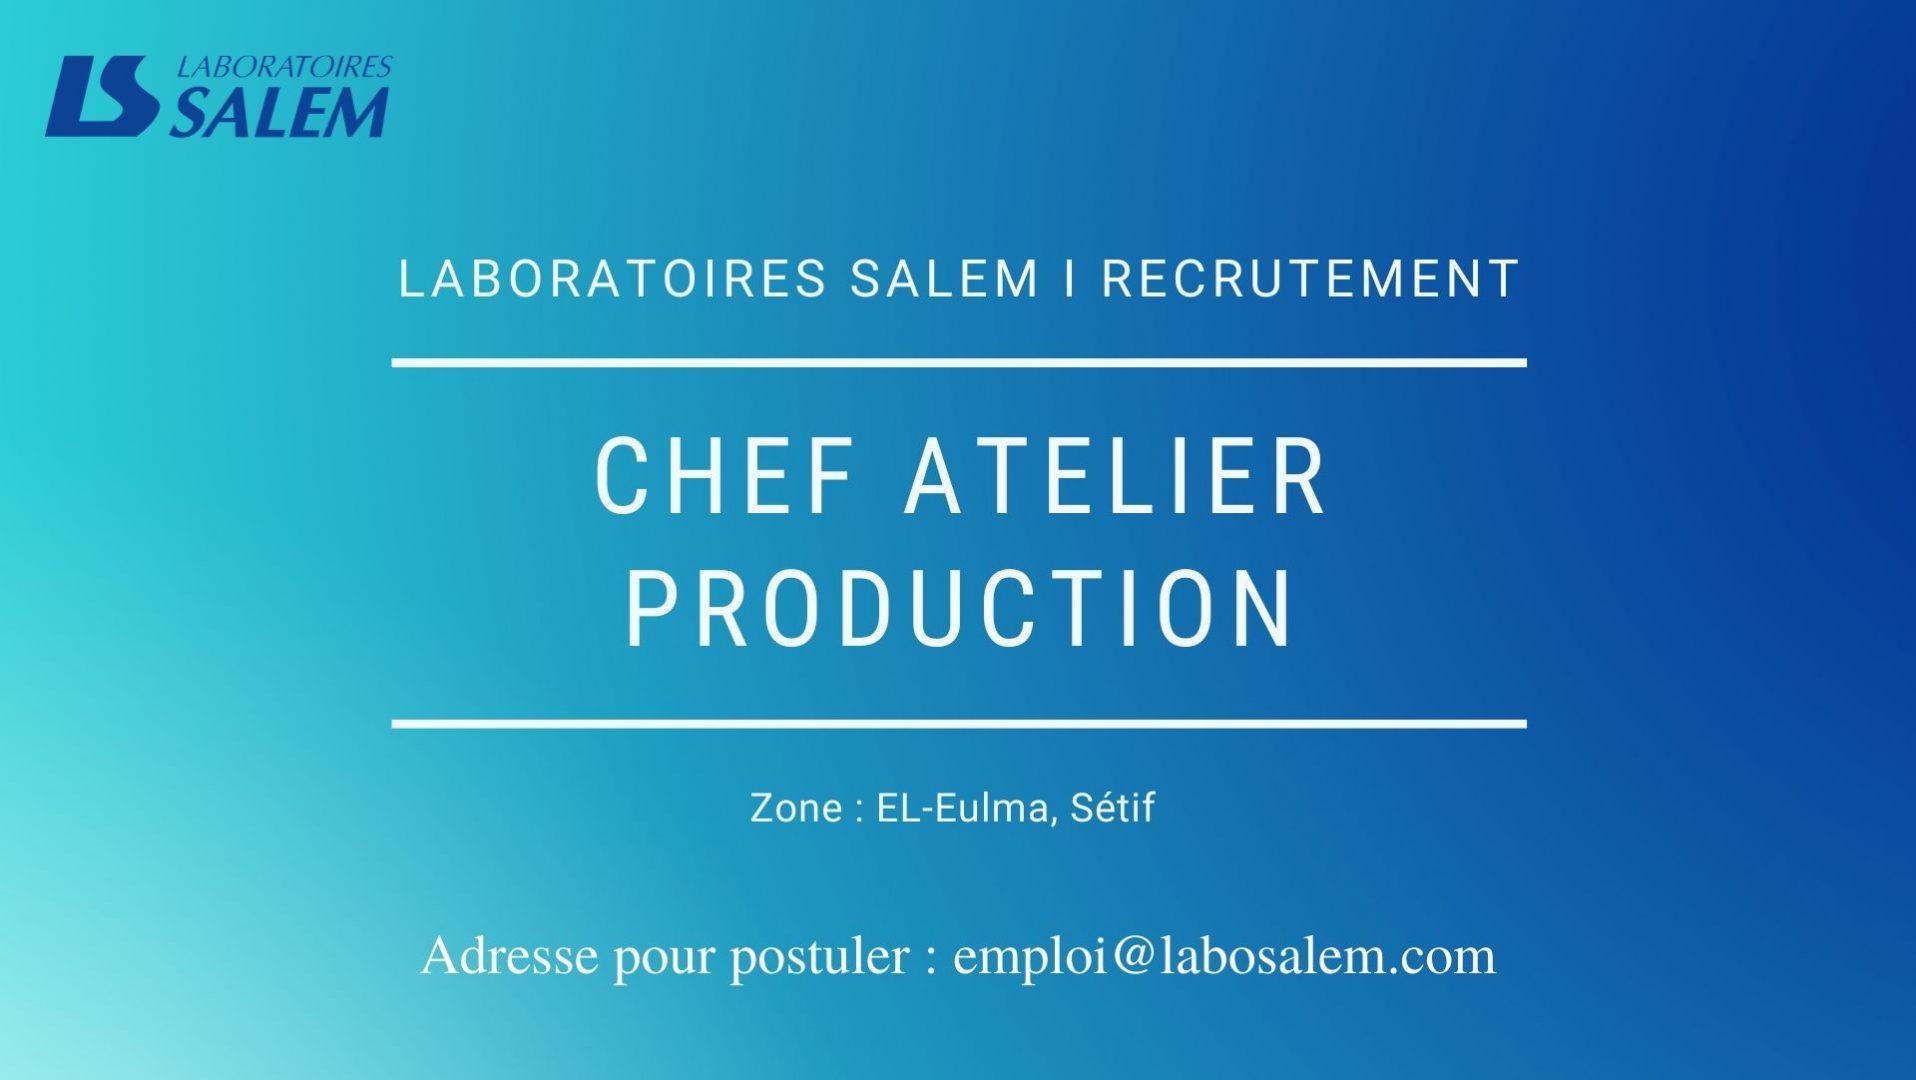 chef d'atelier, recrutement, laboratories salem, pharma, hiring, emplois, travail, job, khedma, production